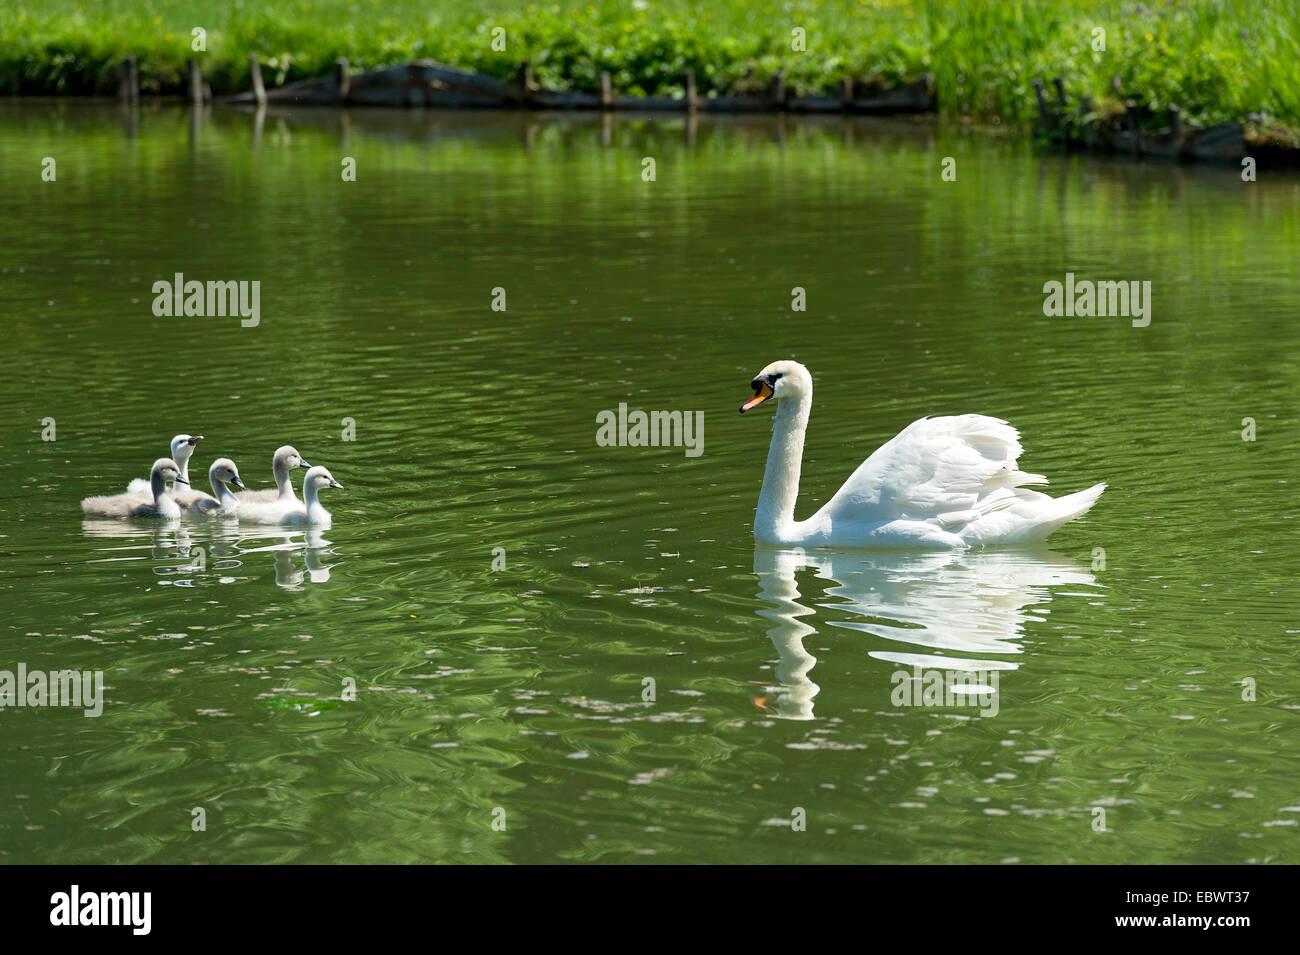 Mute Swan (Cygnus olor) with young birds, Central Canal, Schleissheim Palace complex, Oberschleißheim, Upper - Stock Image